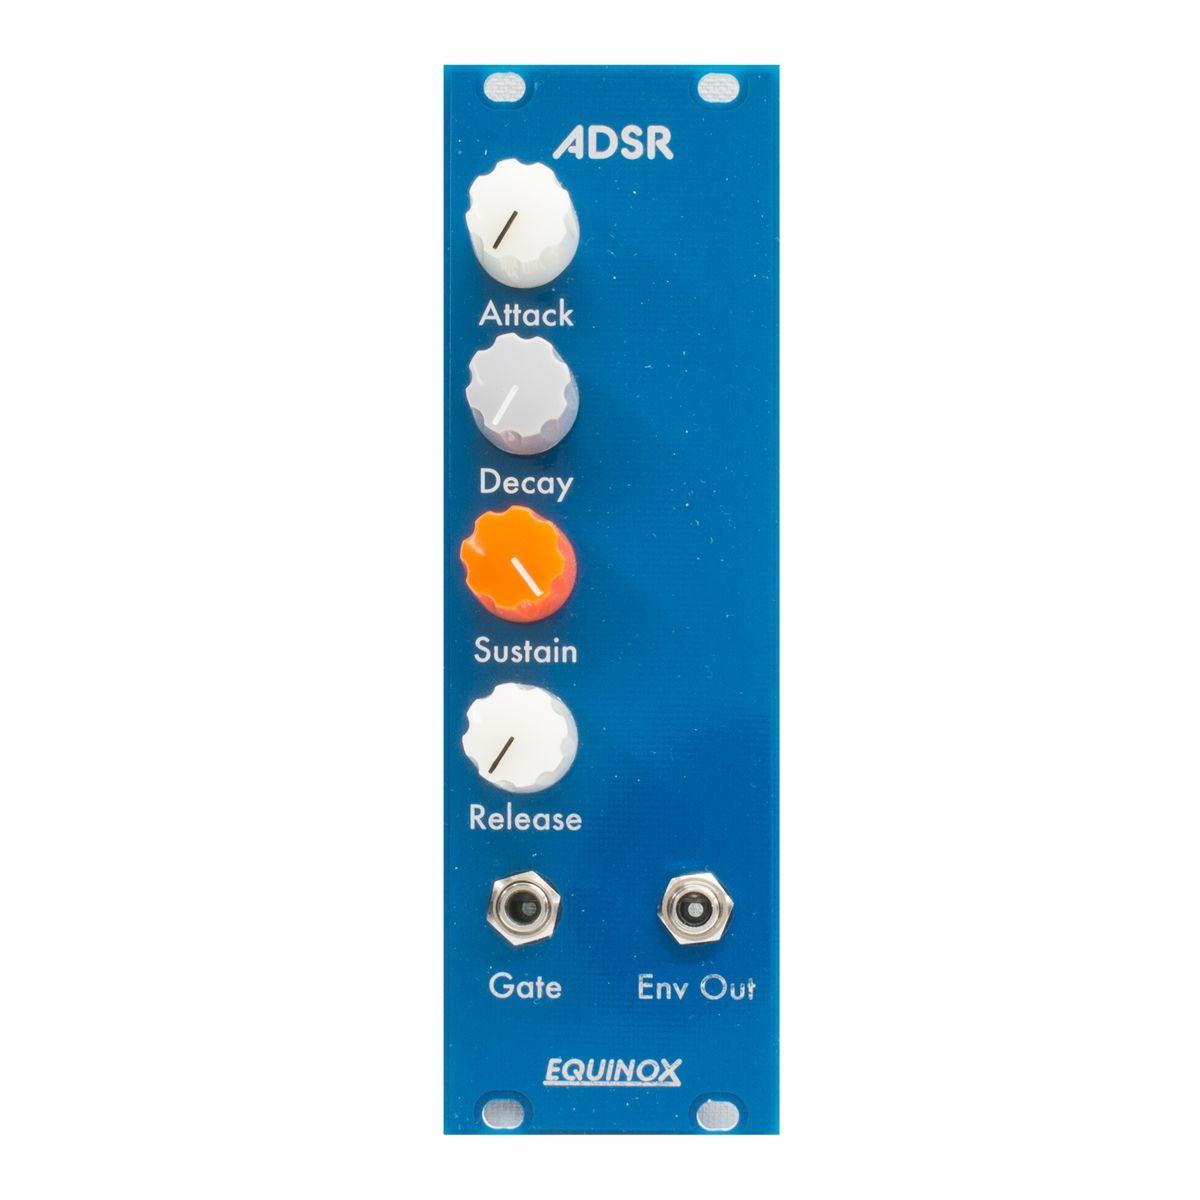 Equinox Modular ADSR Eurorack Module